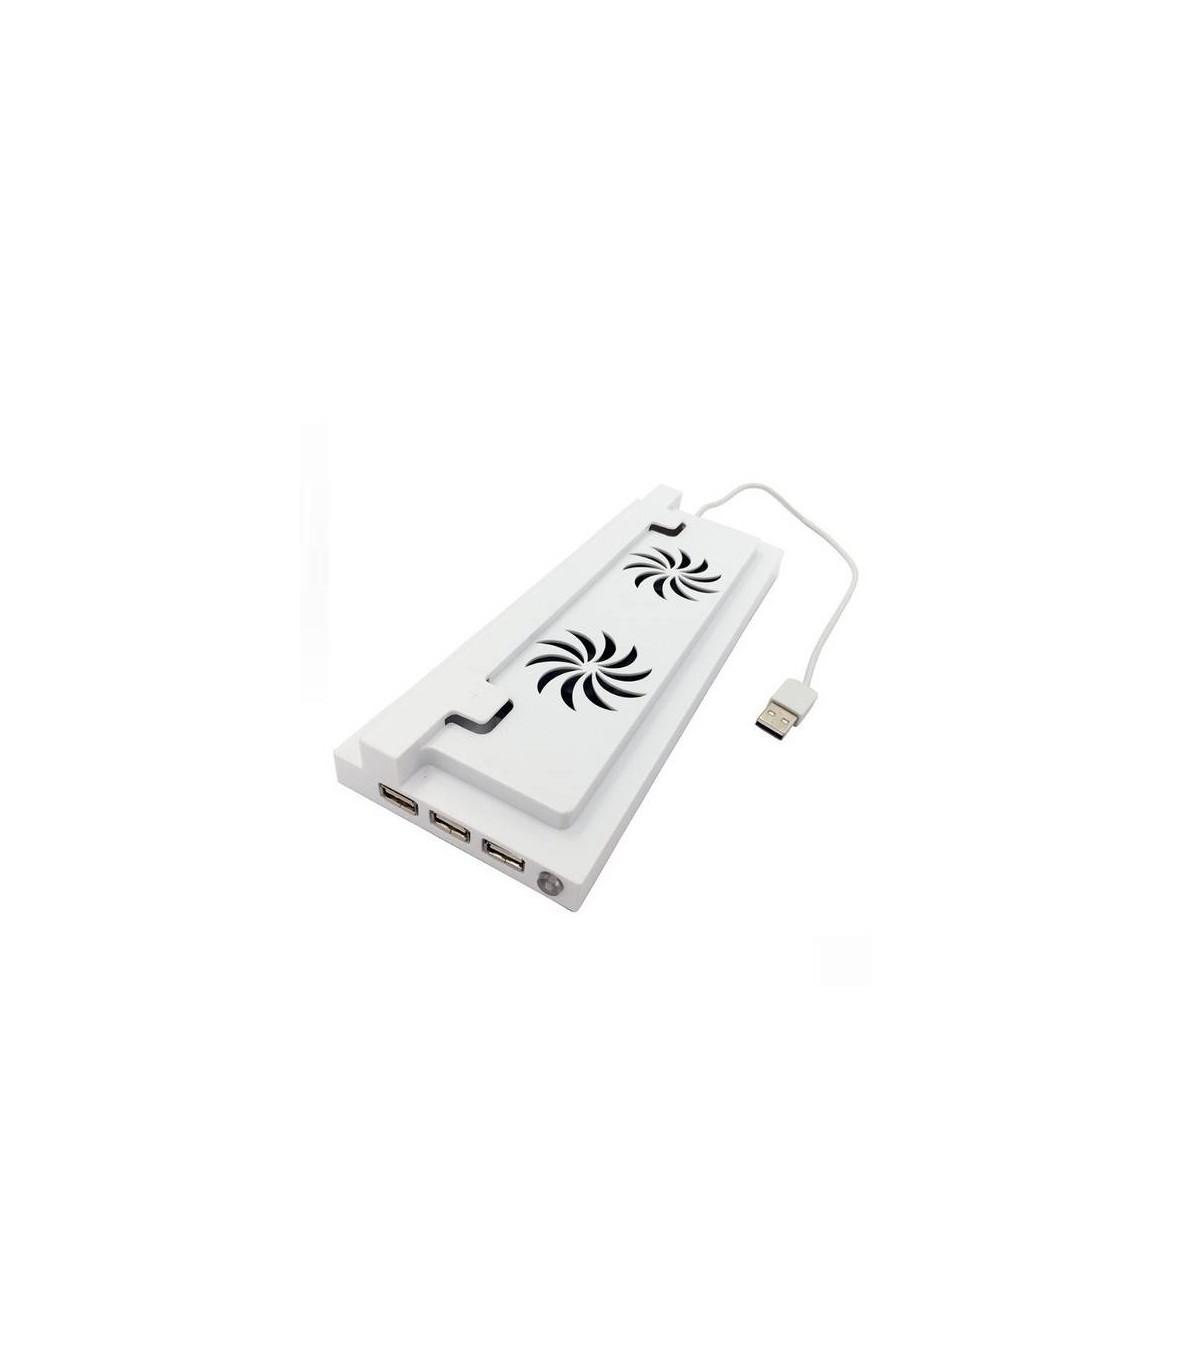 استند فن دار ایکسباکس وان اس Stand Xbox One S With Fan And USB Hub